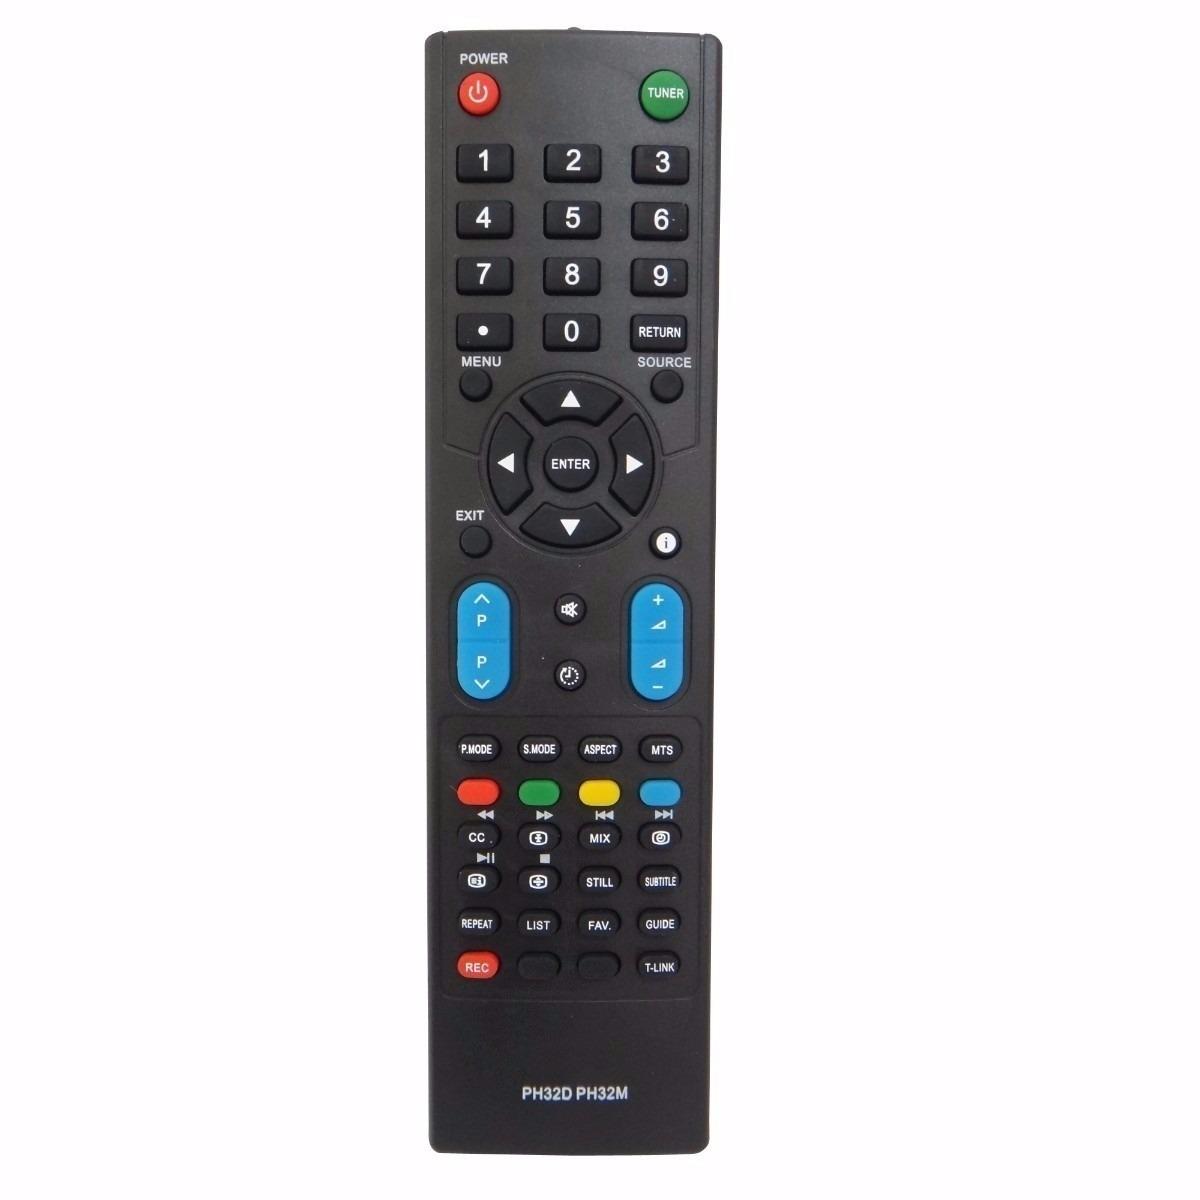 Controle Remoto Tv Philco Lcd Led Ph29t21d Ph29e63d R